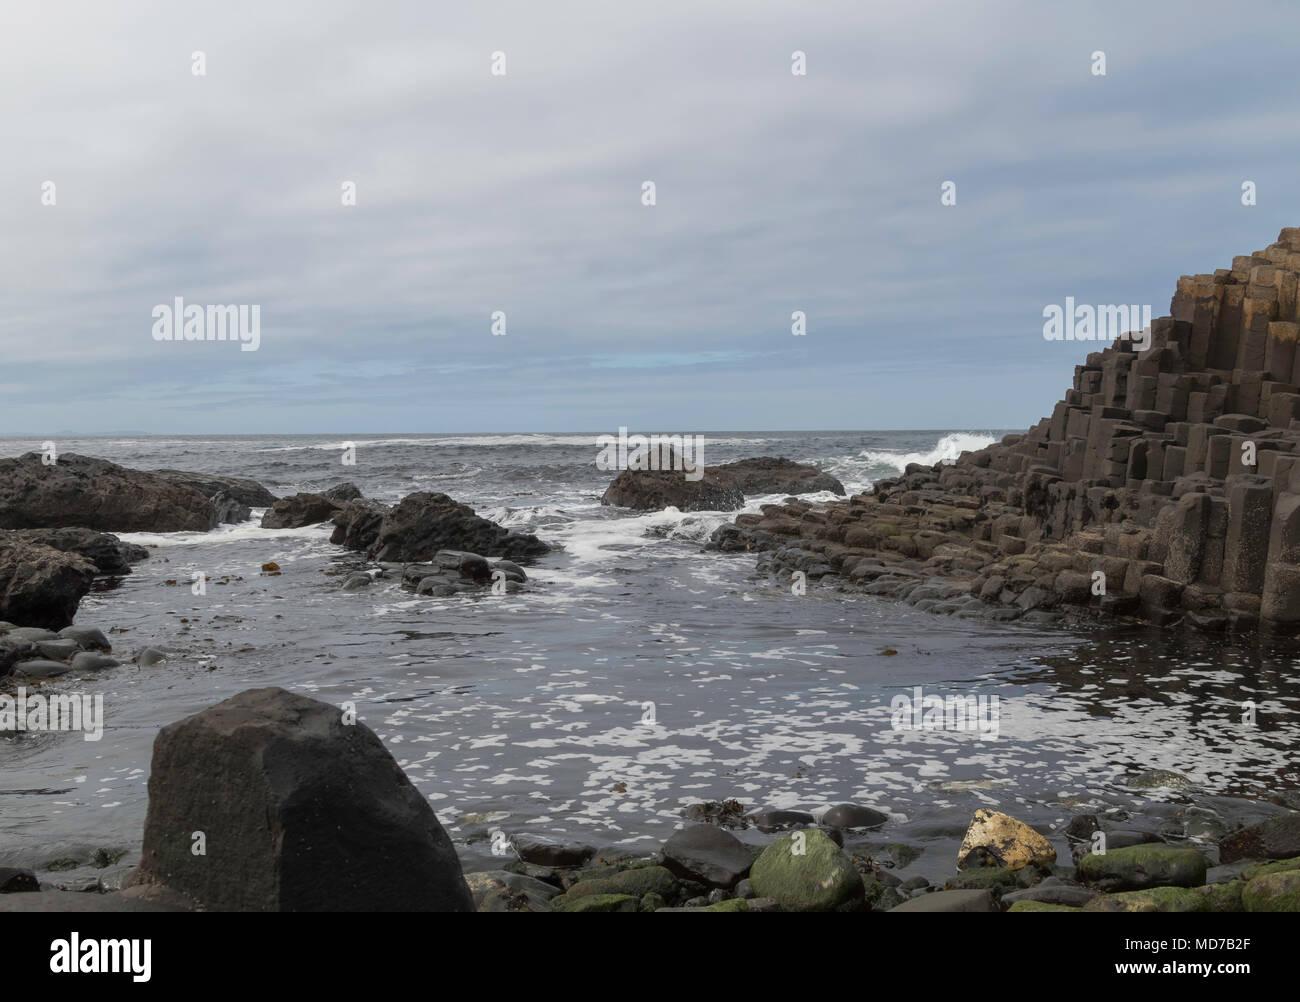 Giant's Causeway Natural Hexagonal Rocks, Atlantic Coastline, Northern Ireland - Stock Image